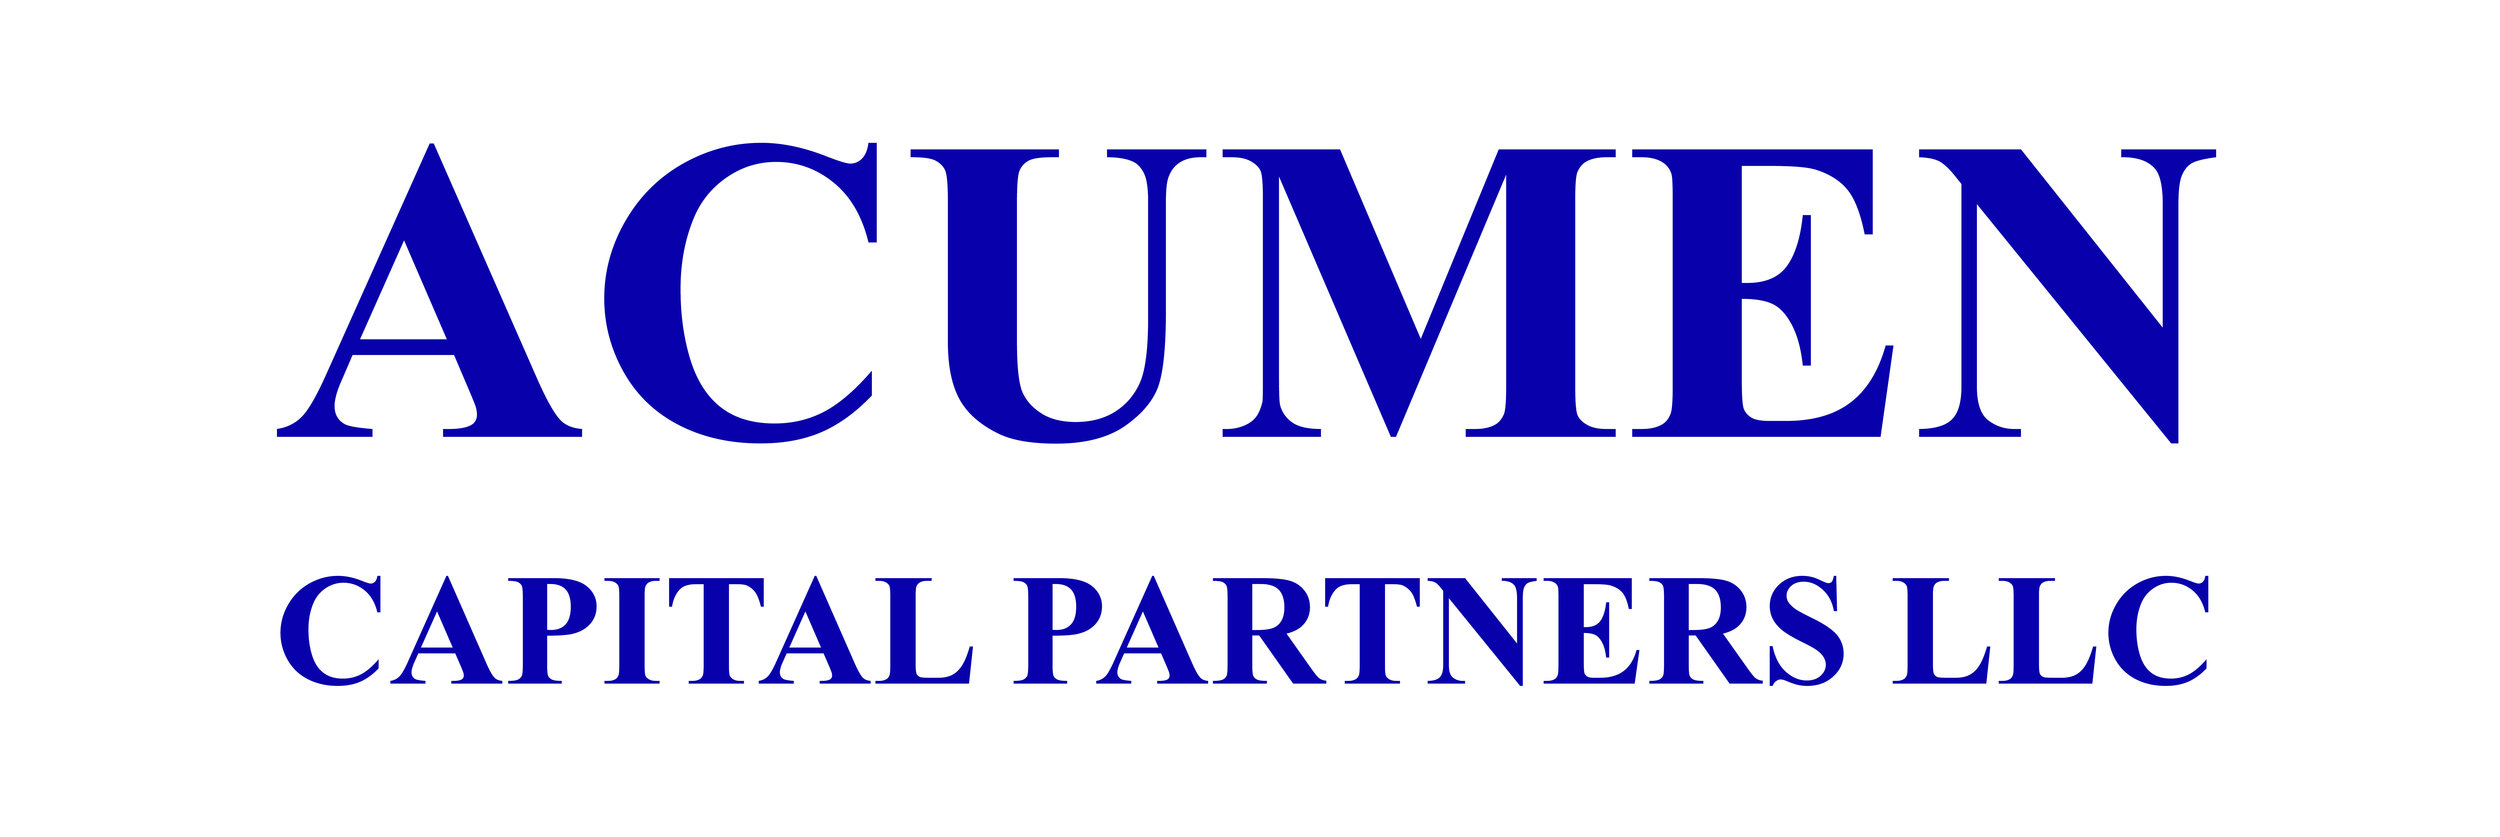 Acumen Logo Blue Font.jpg